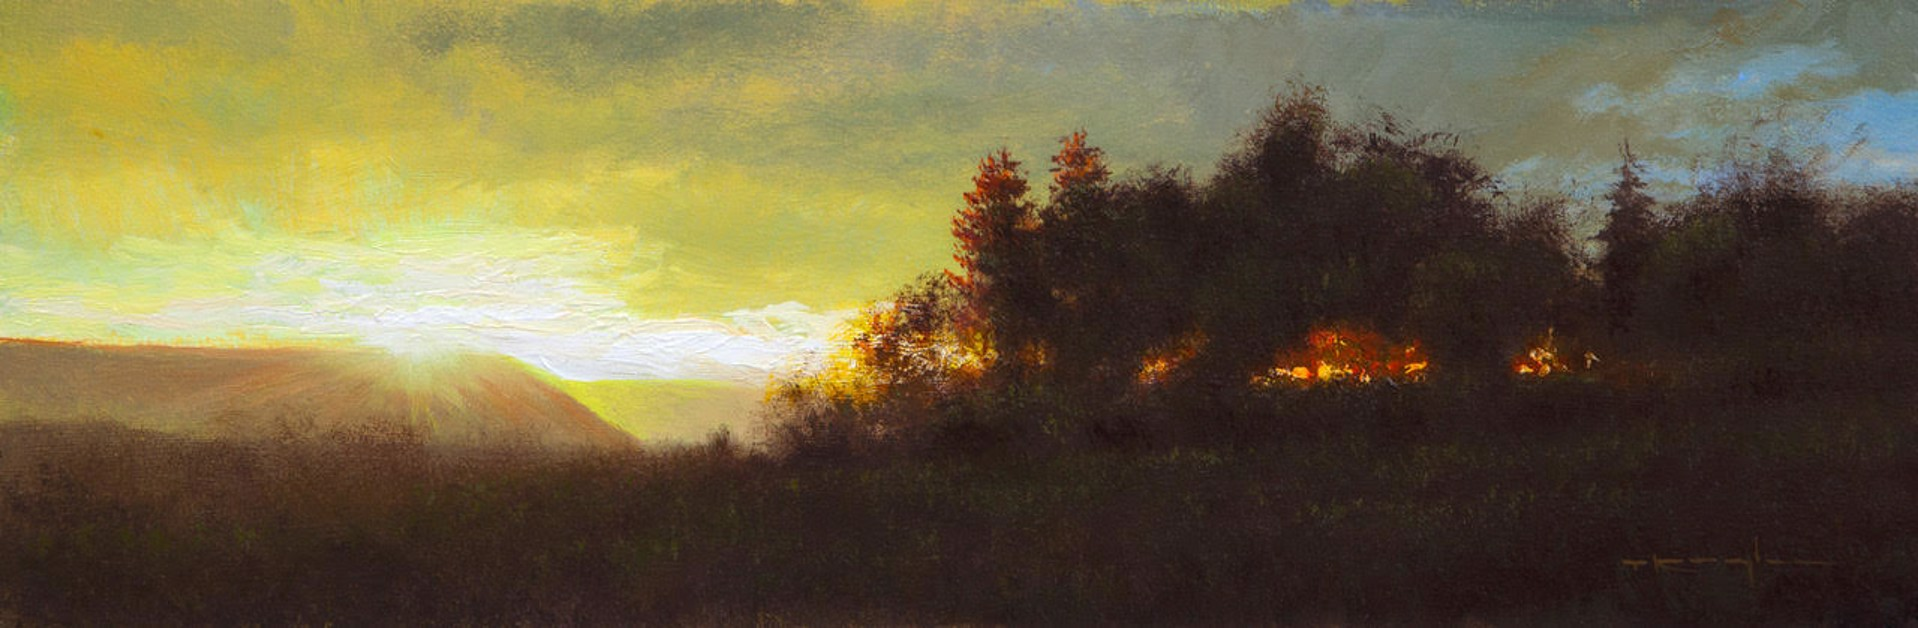 New Dawn, Psalm 63:5-6 by Thomas Kegler